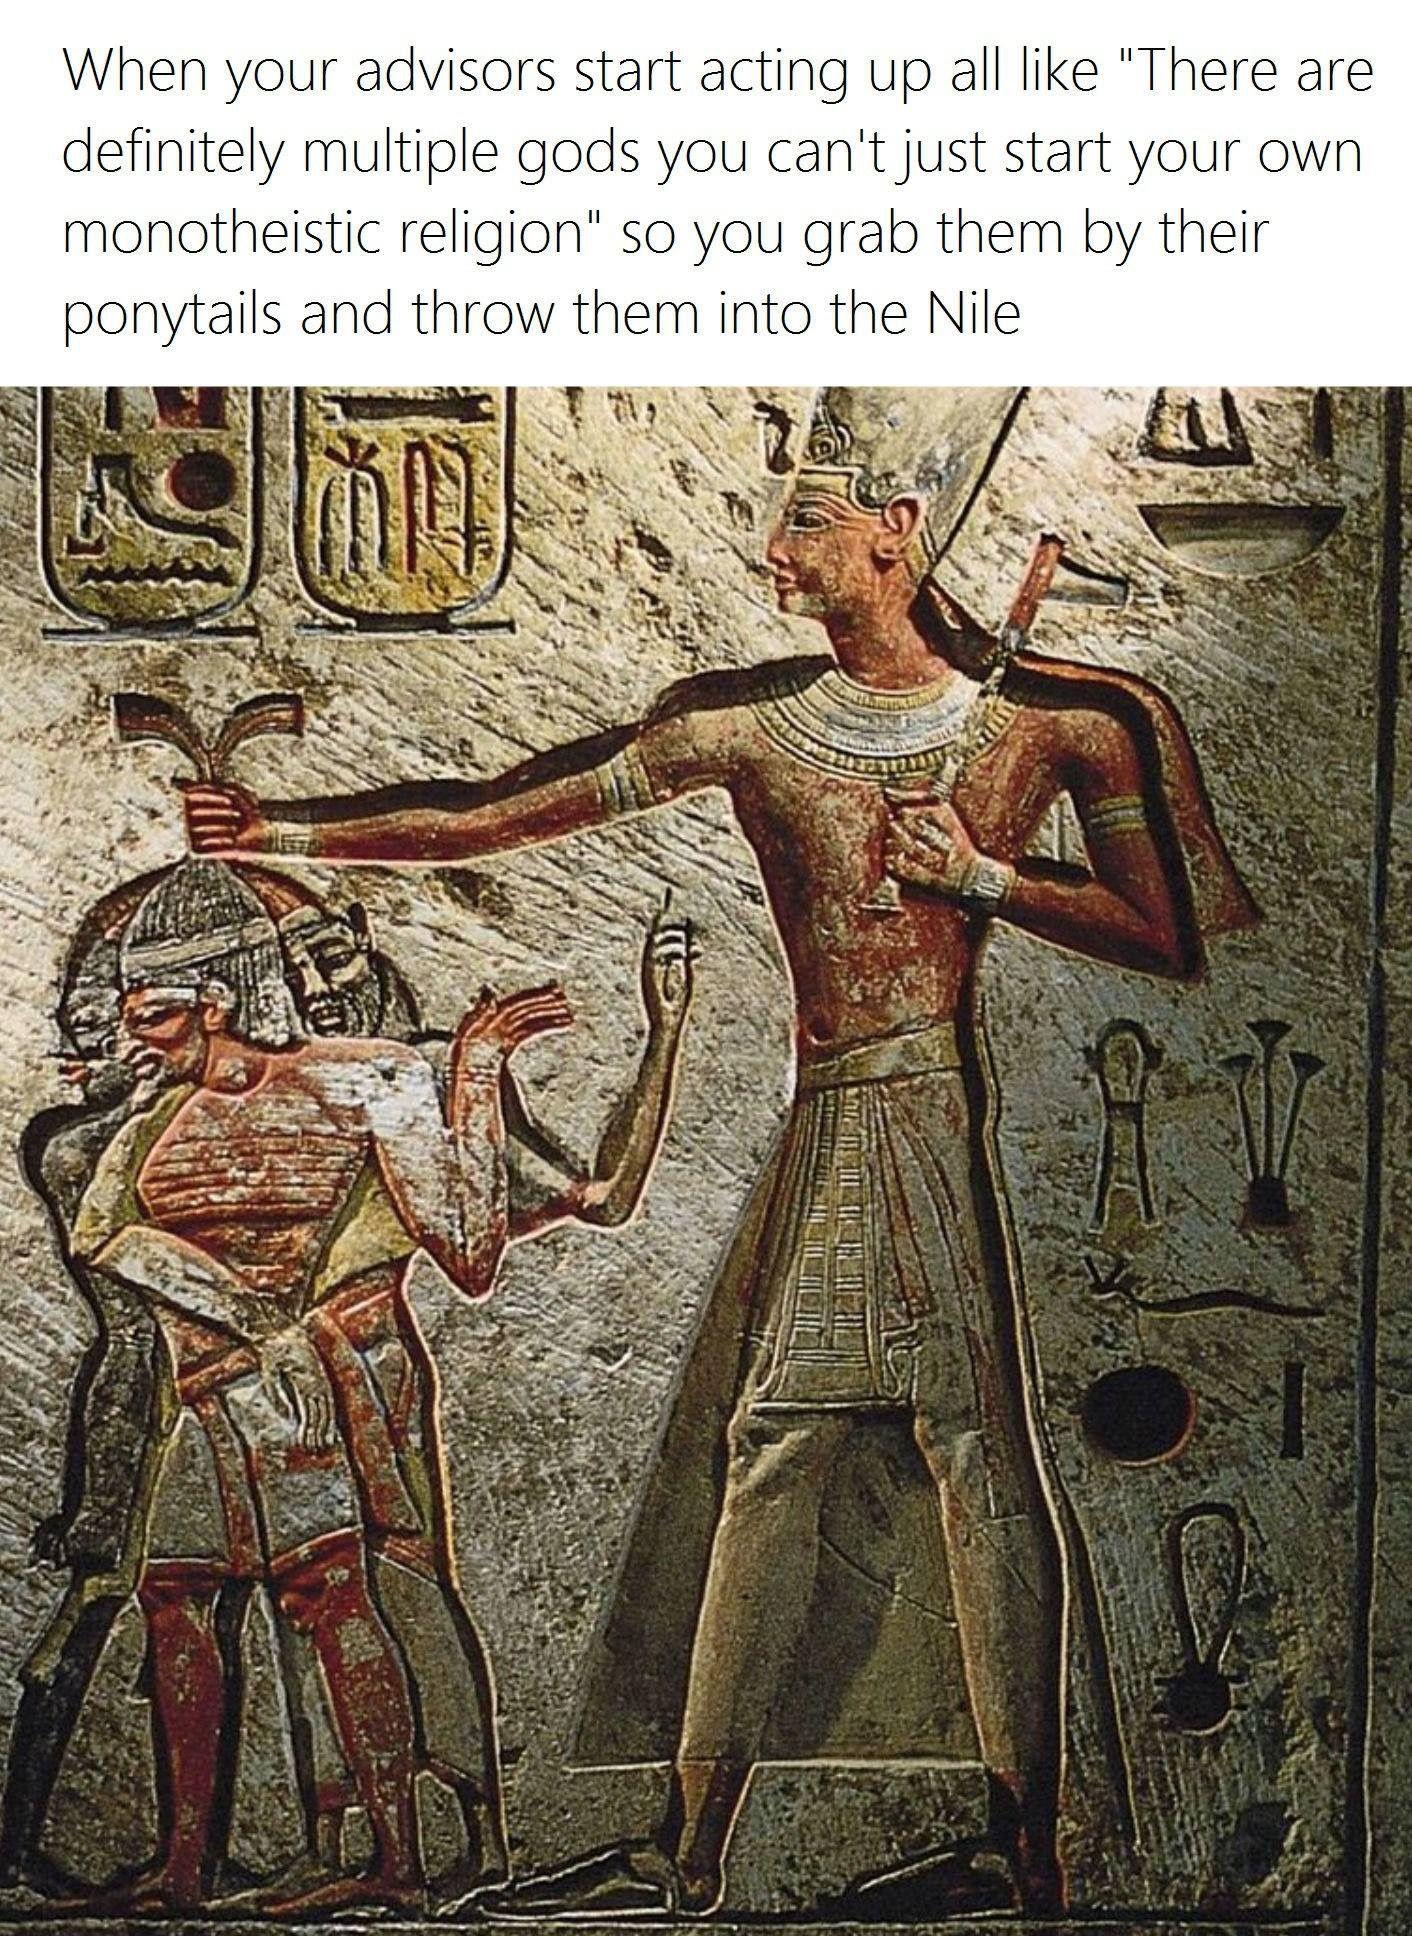 251b00ca60fb9e0a7851246df30865db pin by zephyra on classical art memes pinterest classical art